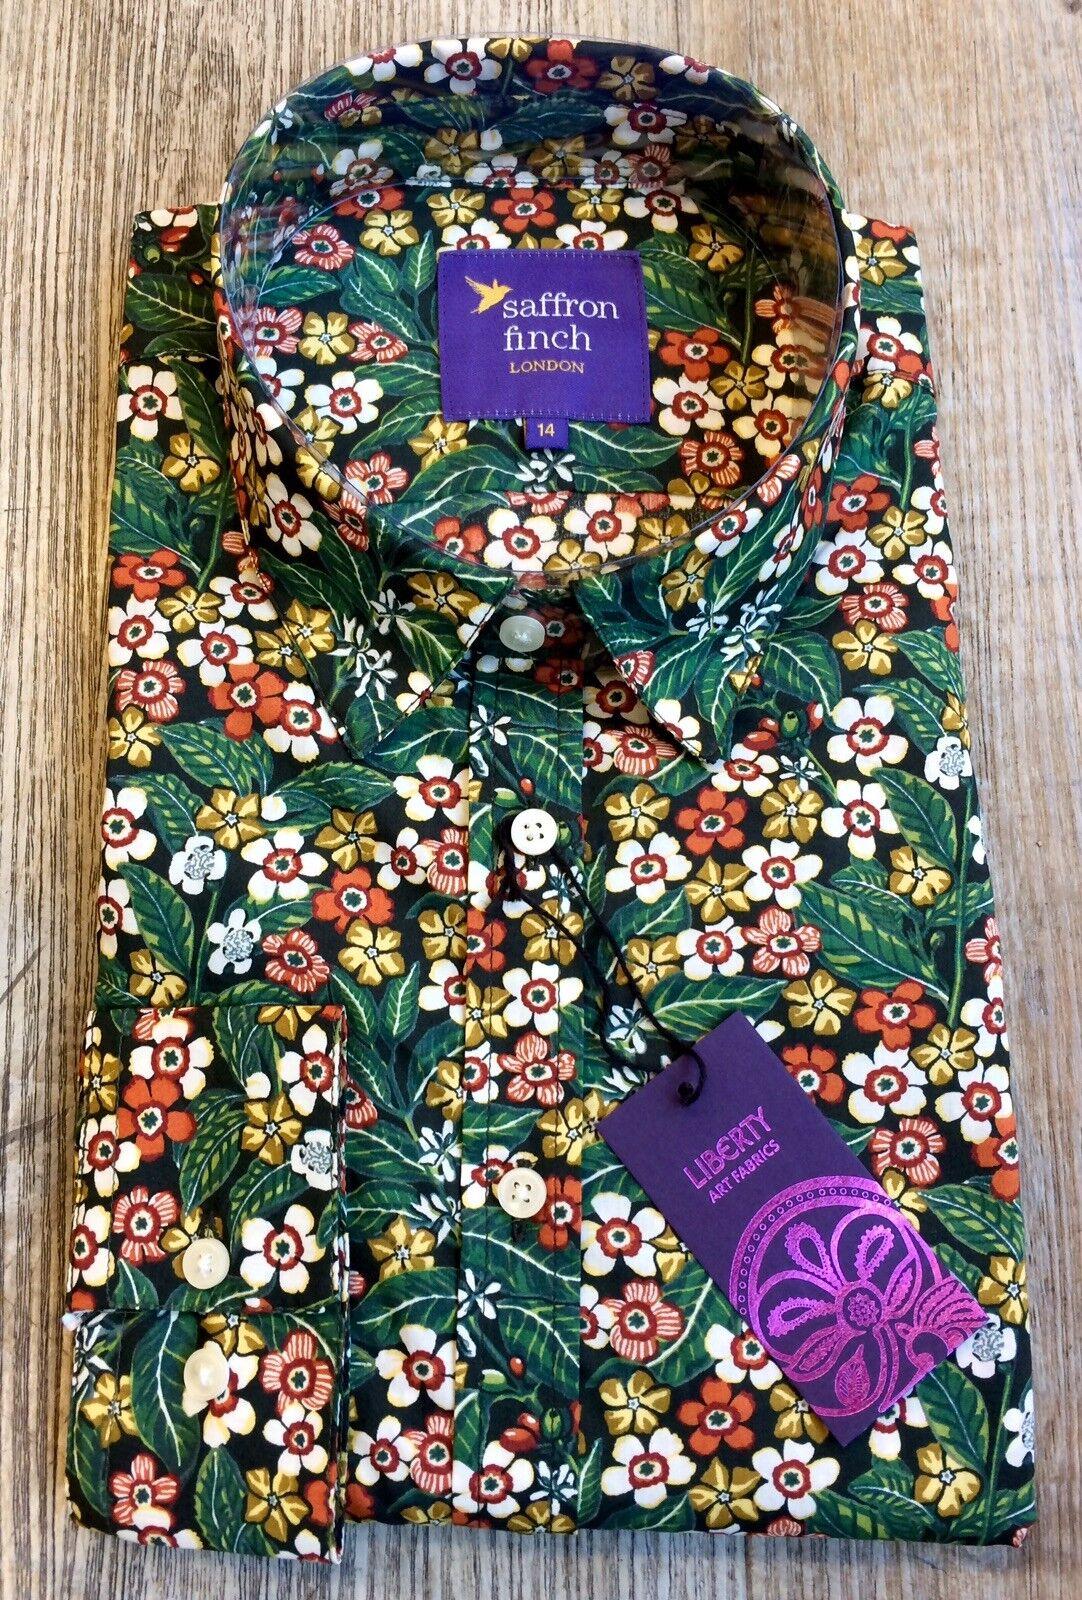 New damen Liberty Print LIMITED EDITION MariGold Floral Shirt By Saffron Finch.